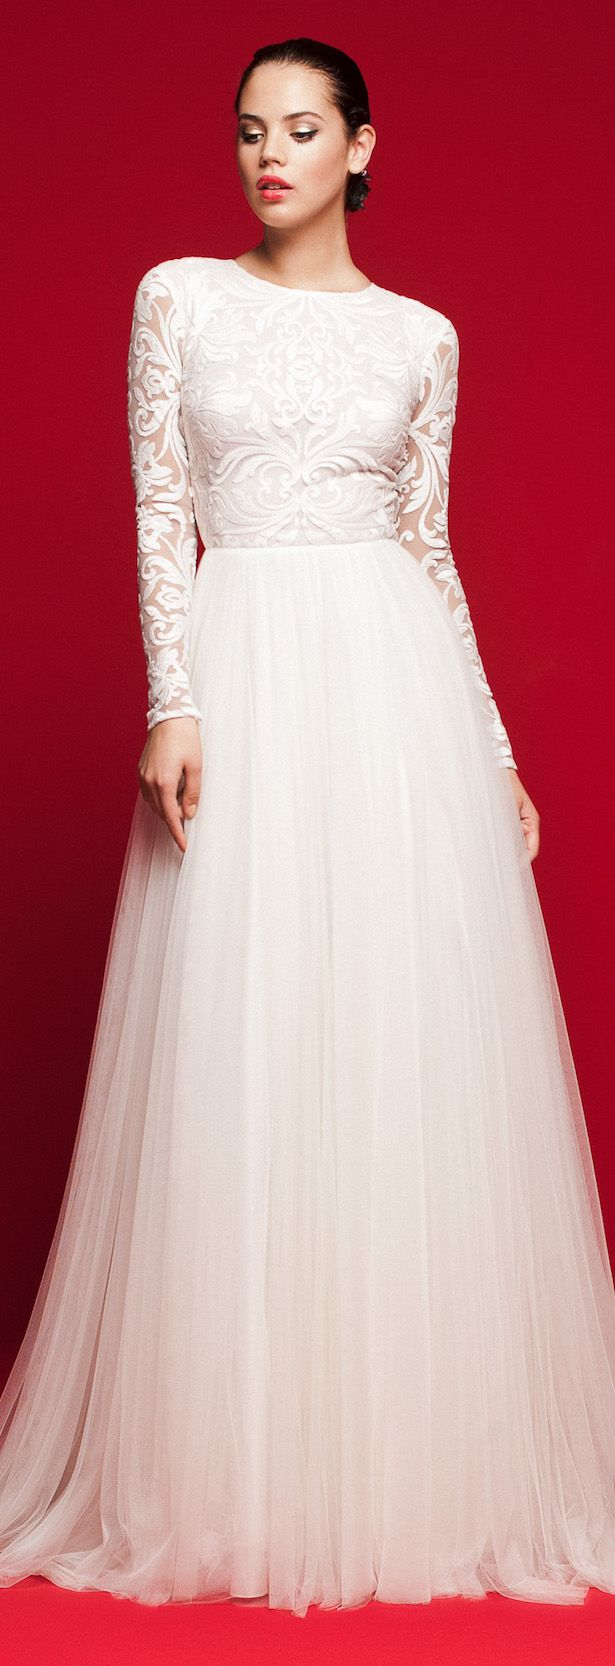 Daalarna couture wedding dresses pinterest bridal